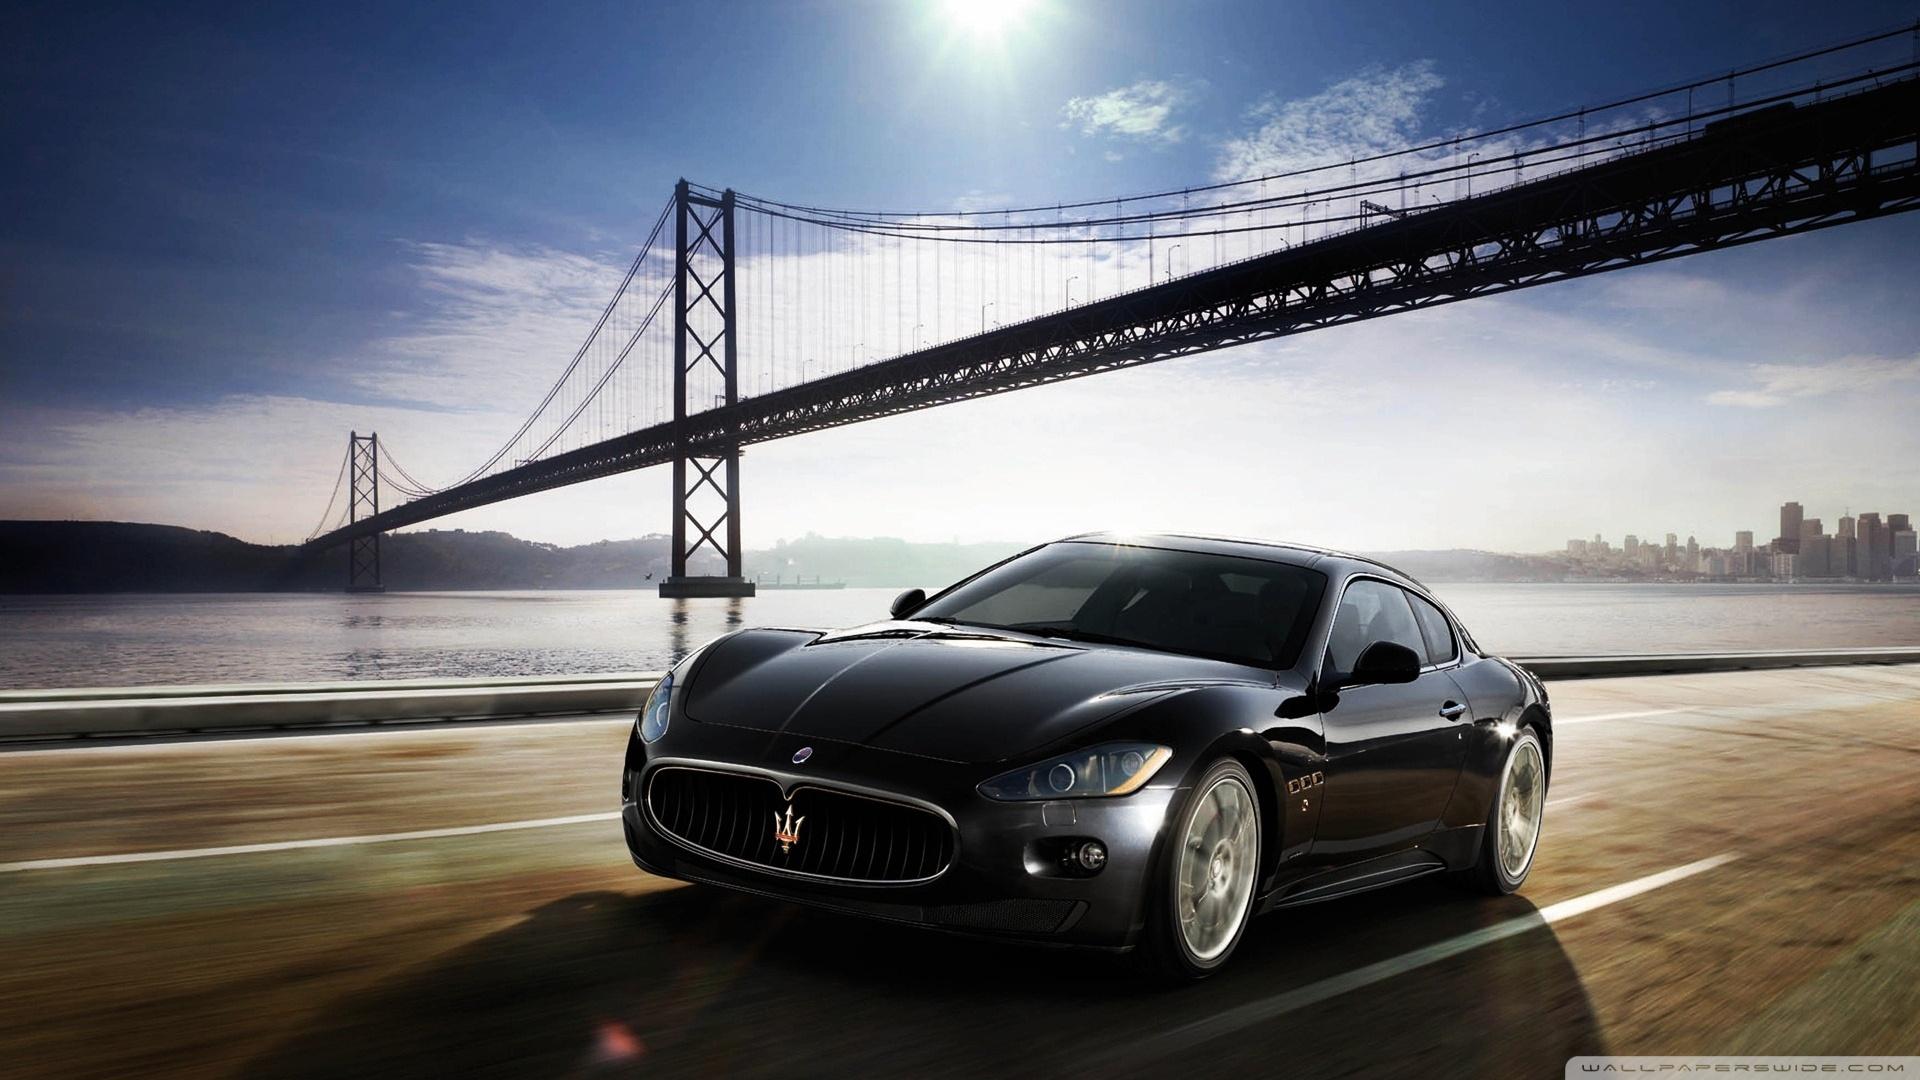 Maserati GranTurismo 4K HD Desktop Wallpaper for 4K Ultra HD TV 1920x1080